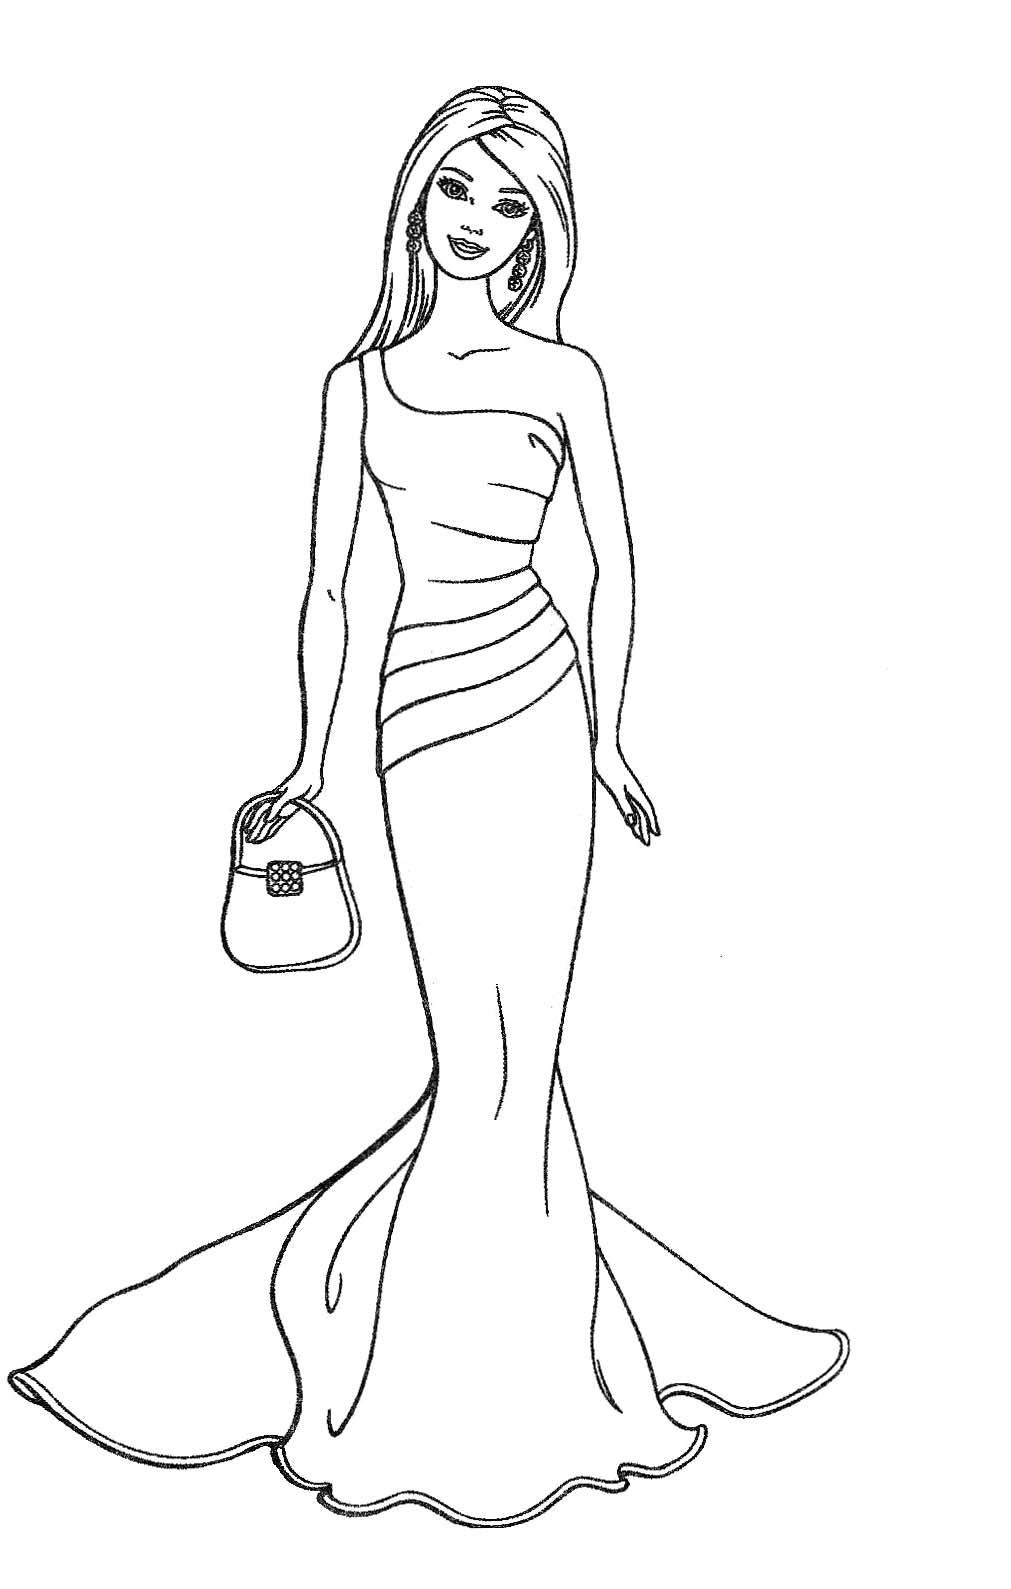 Barbie clipart drawing. Doll cartoon sketch pencil